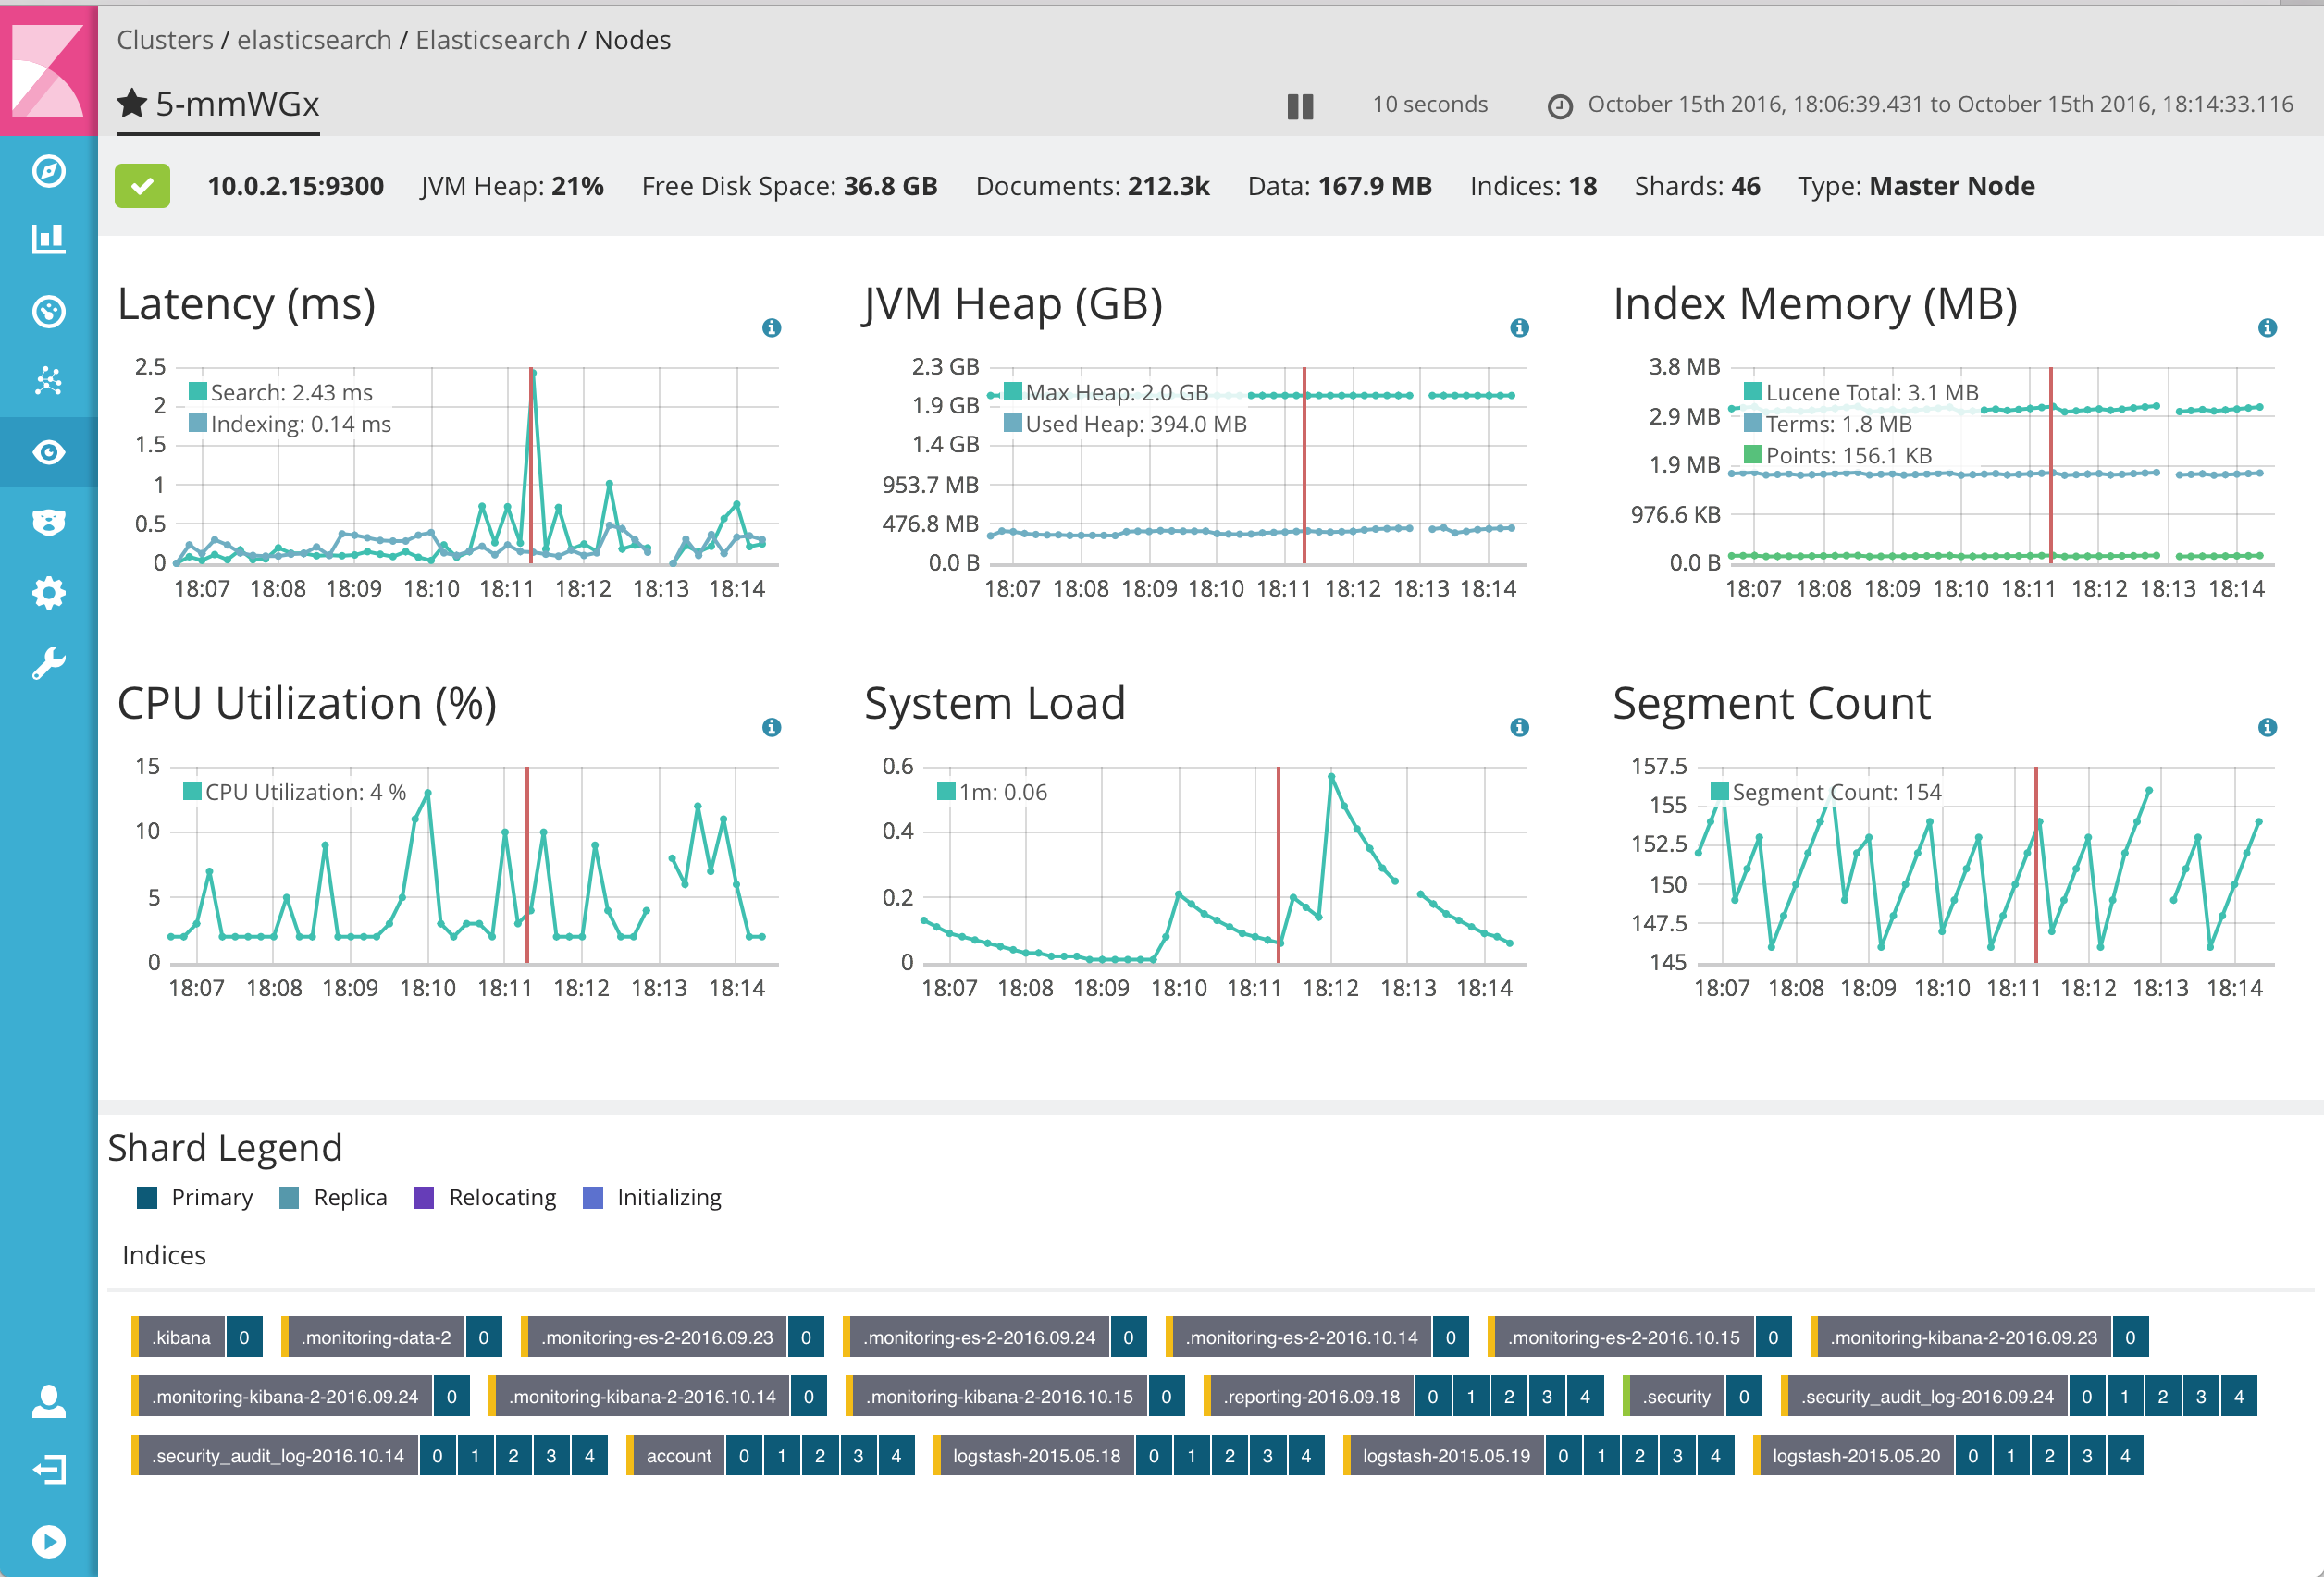 Monitoring_-_elasticsearch_-_Elasticsearch_-_Nodes_-_5-mmWGx